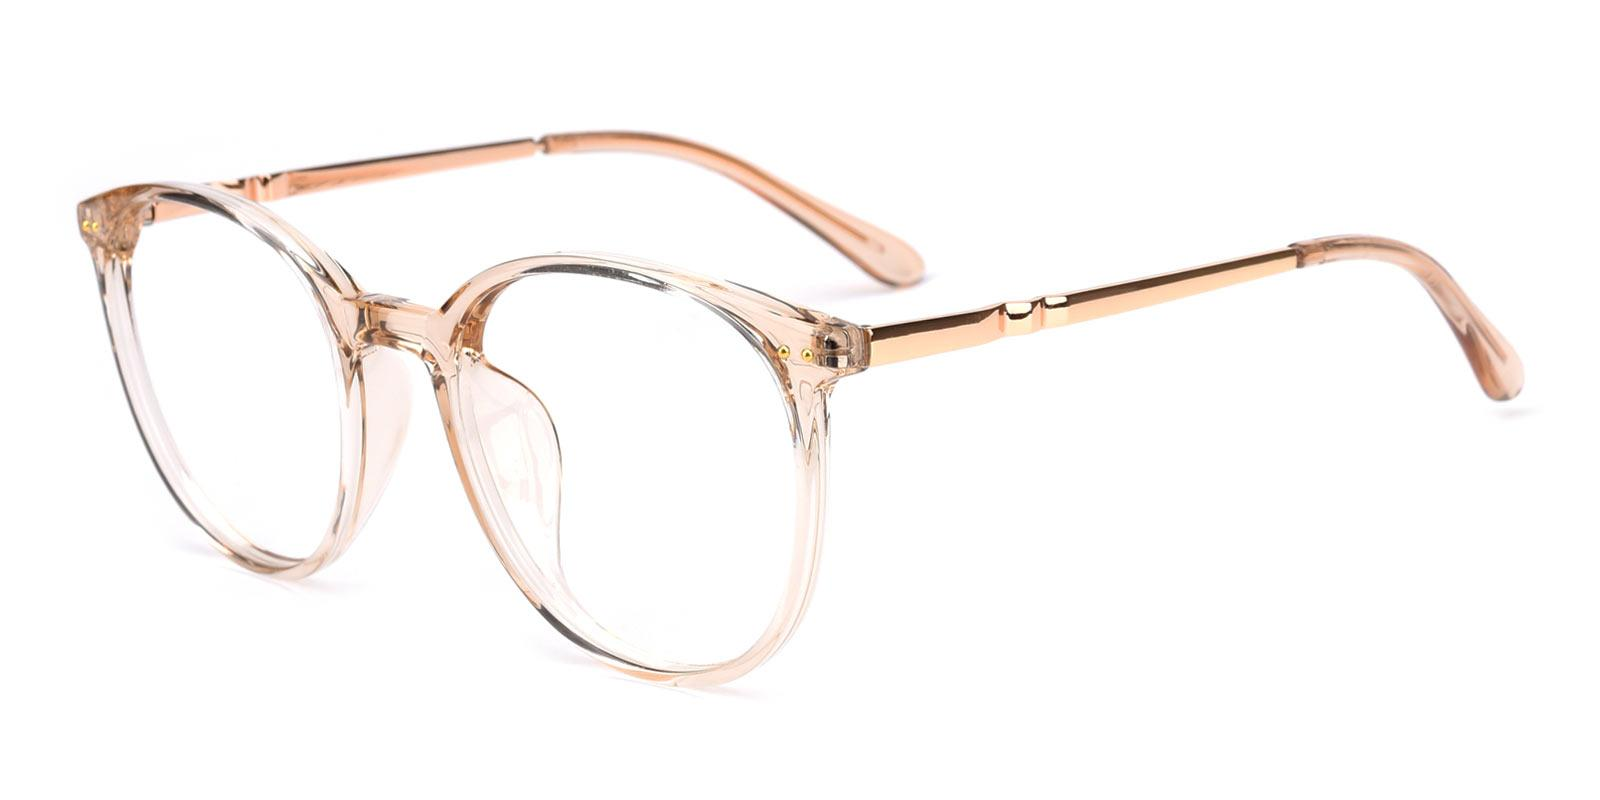 Peacock-Orange-Round-Acetate-Eyeglasses-detail